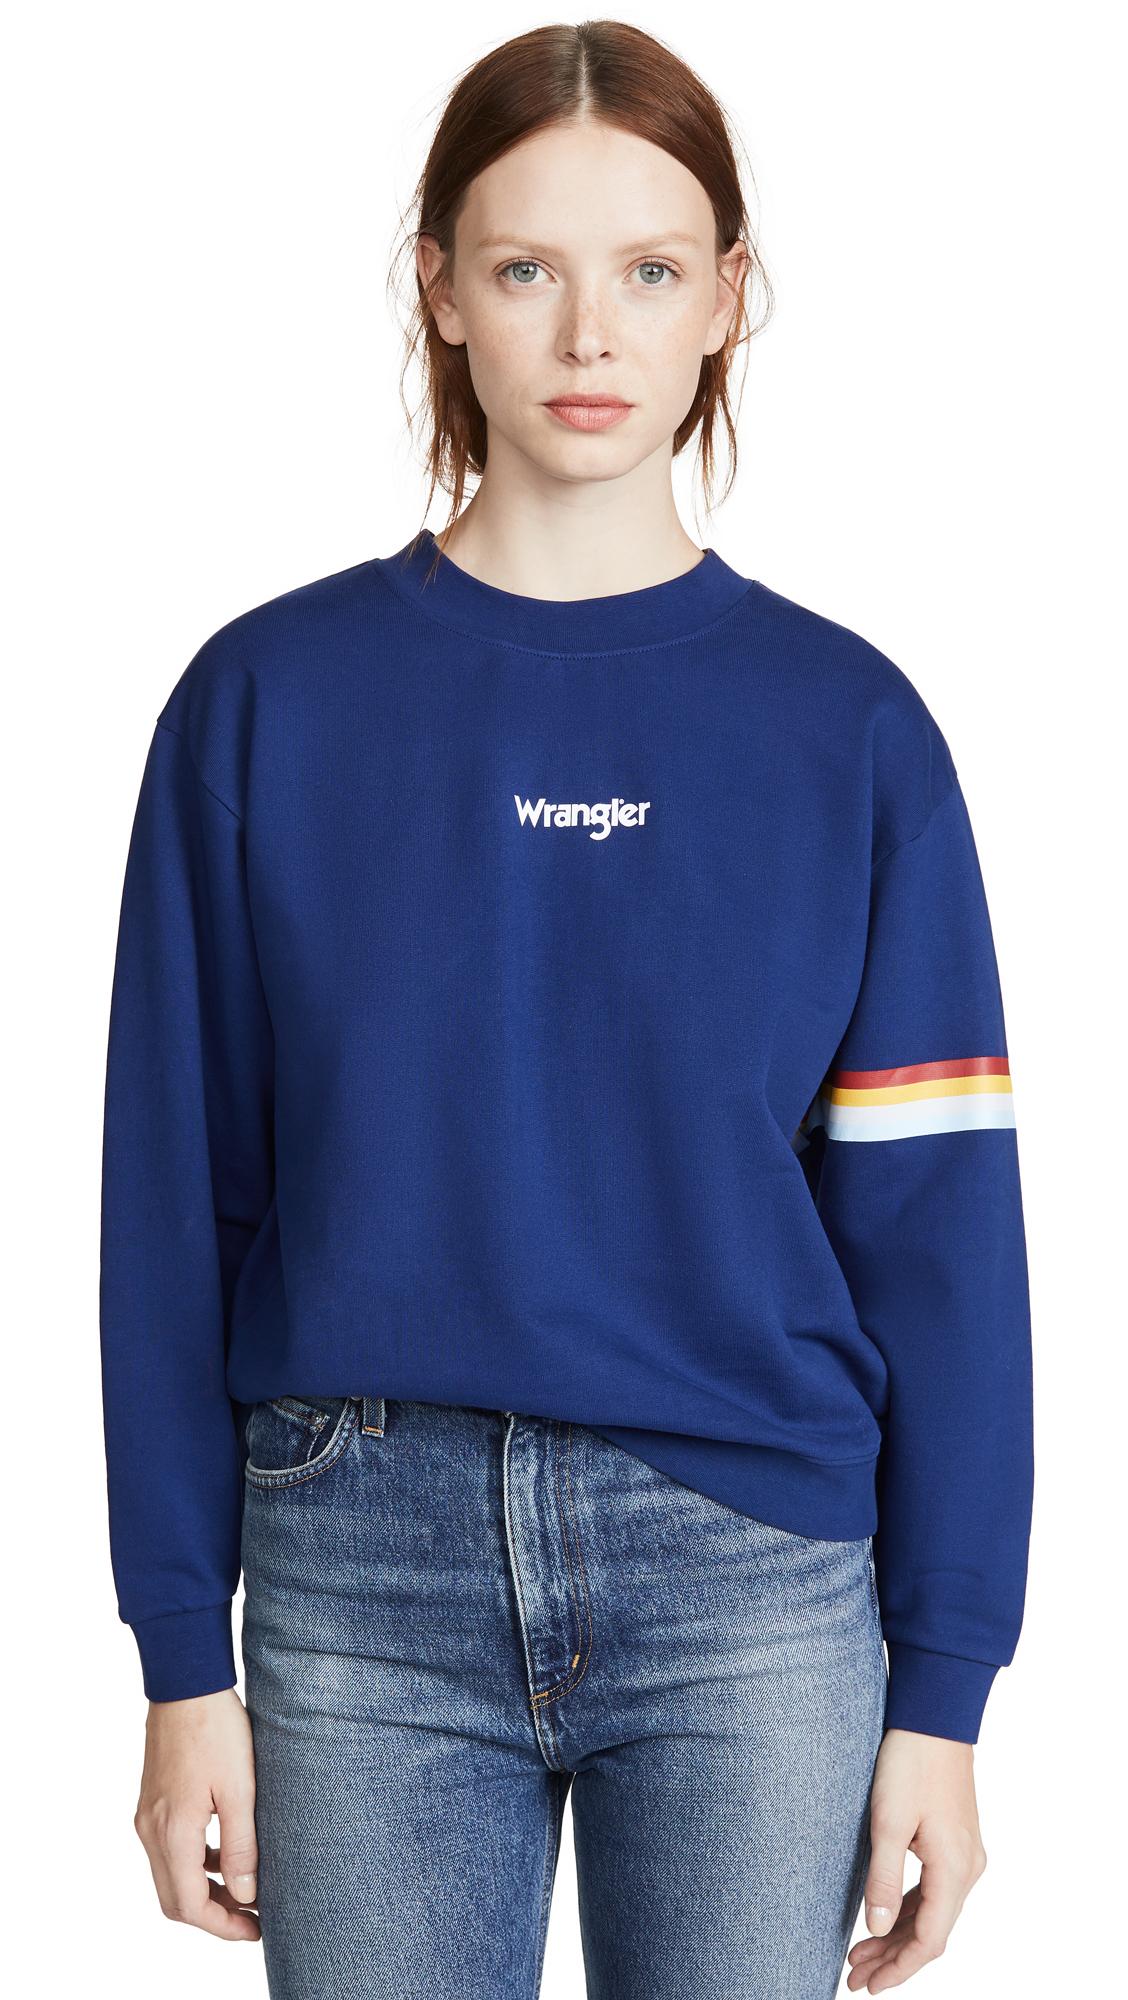 Wrangler 80'S RETRO SWEATSHIRT